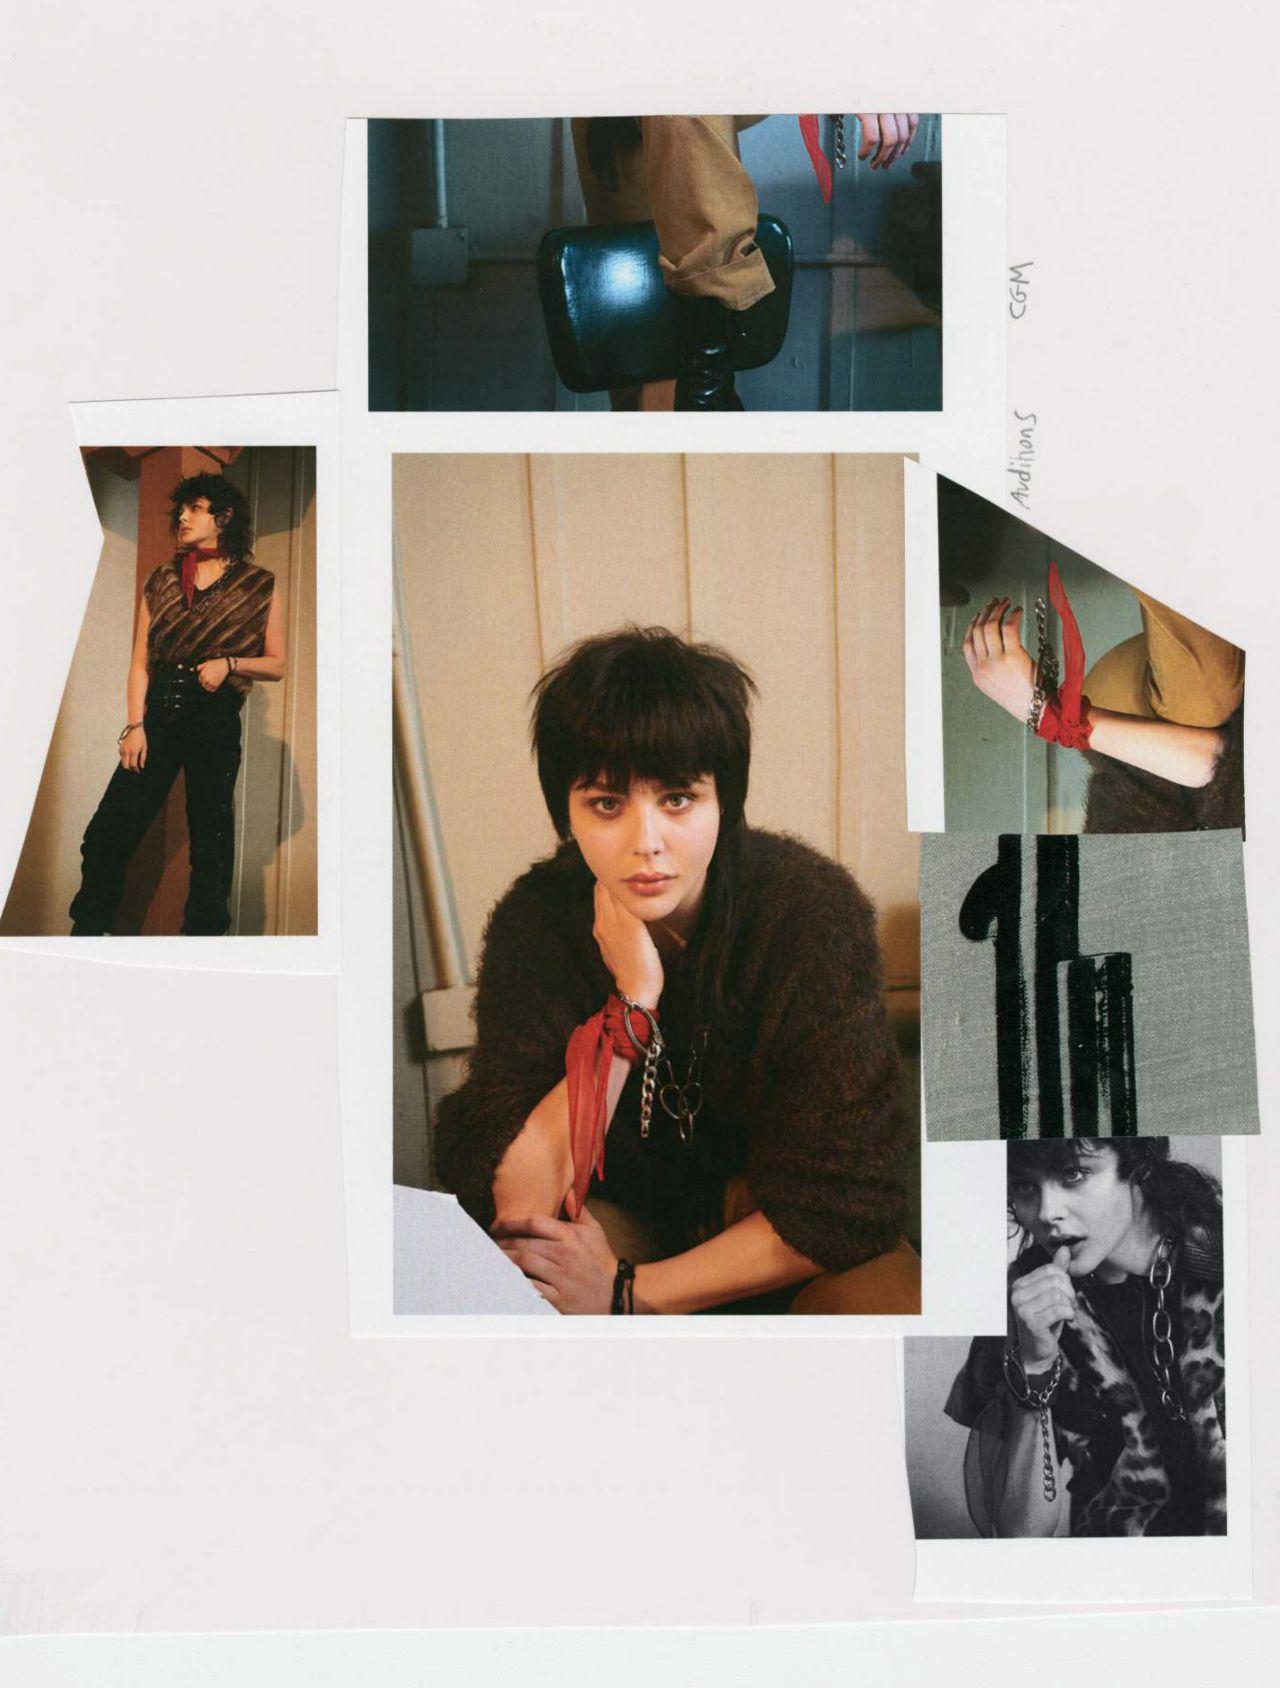 chloe-grace-moretz-another-magazine-autumn-winter-2018-photos-2.jpg